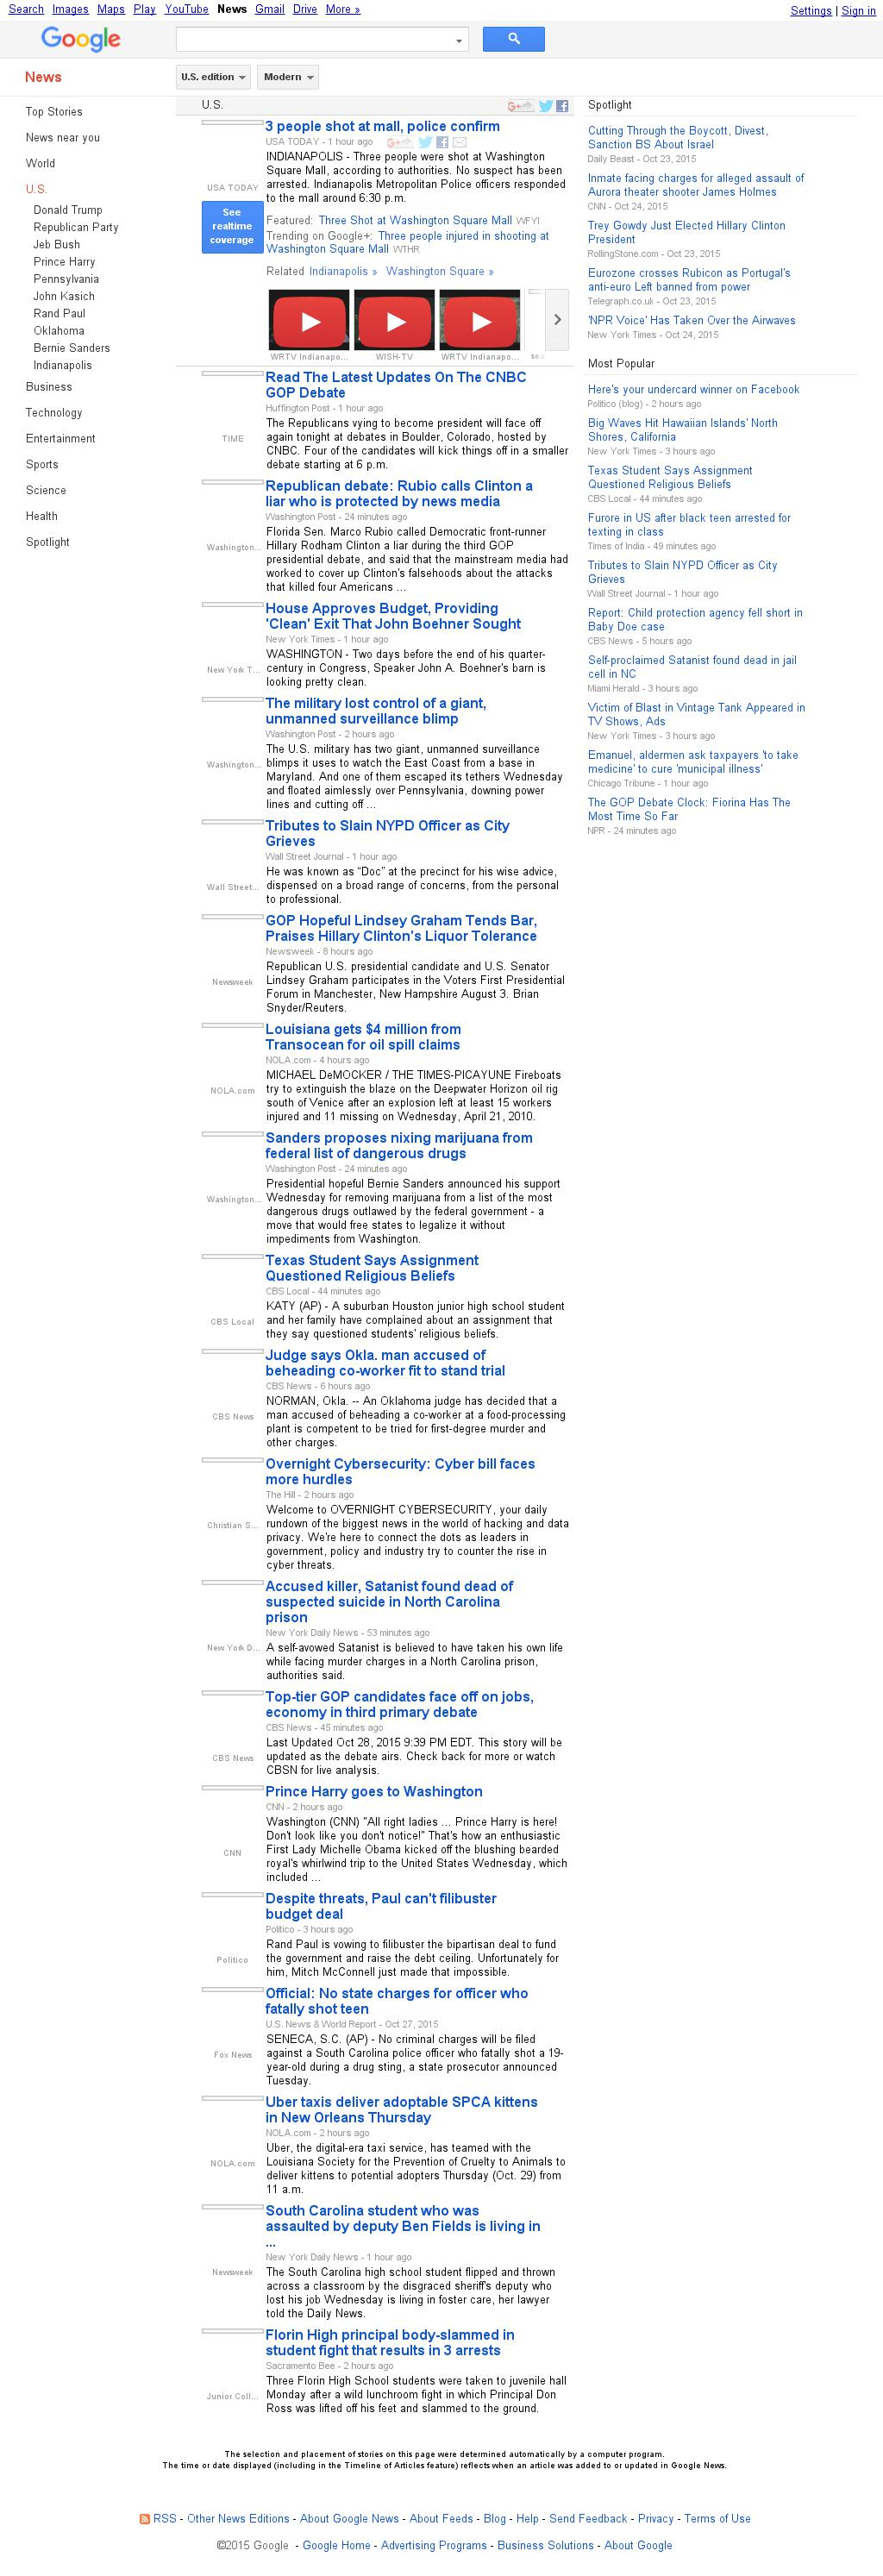 Google News: U.S. at Thursday Oct. 29, 2015, 2:07 a.m. UTC